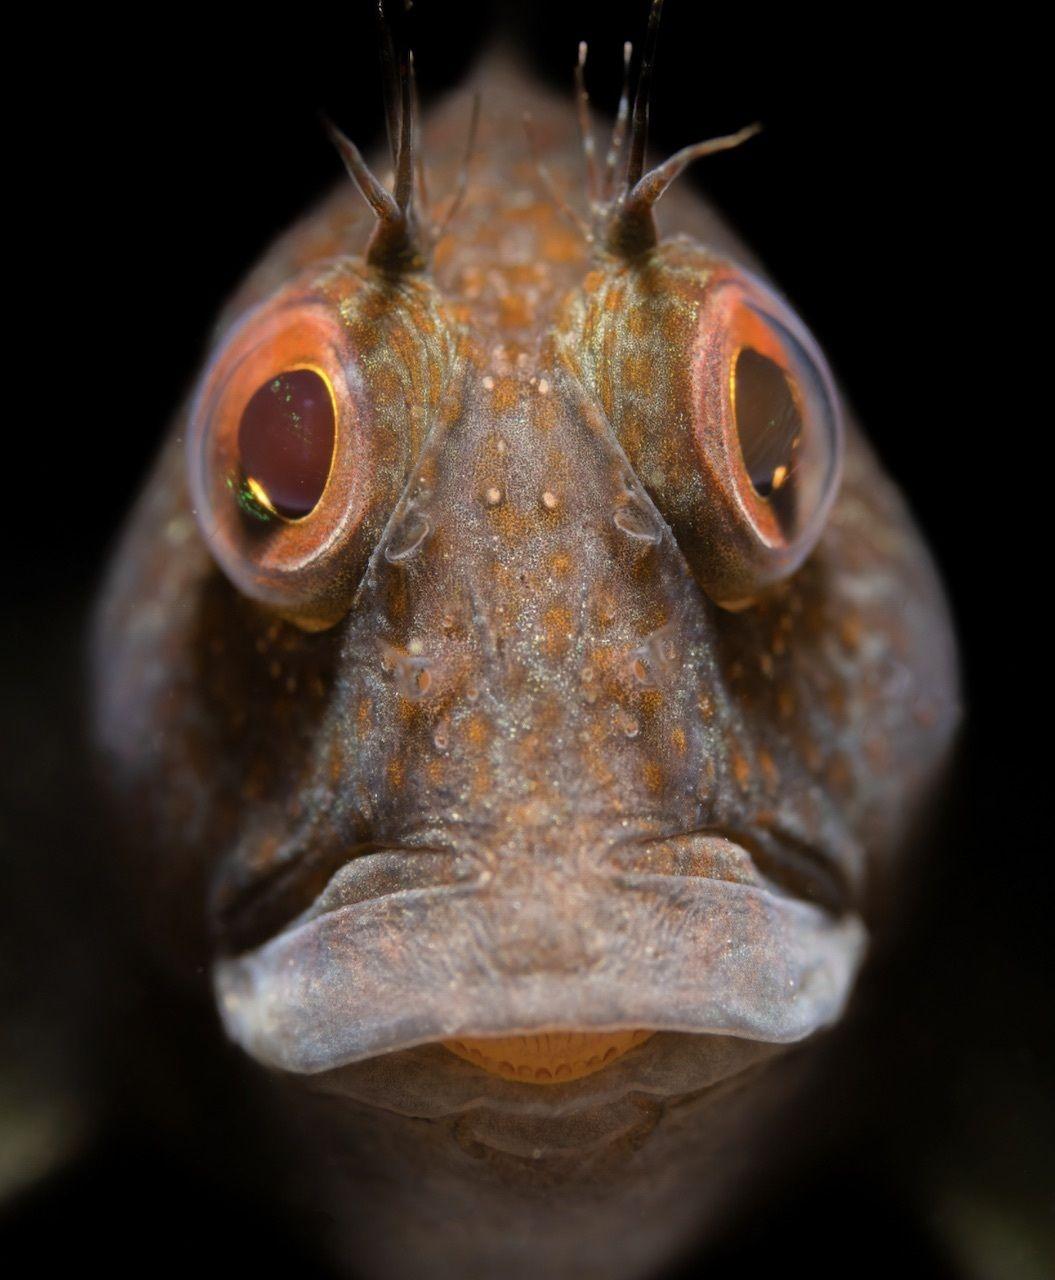 Macro view of a fish